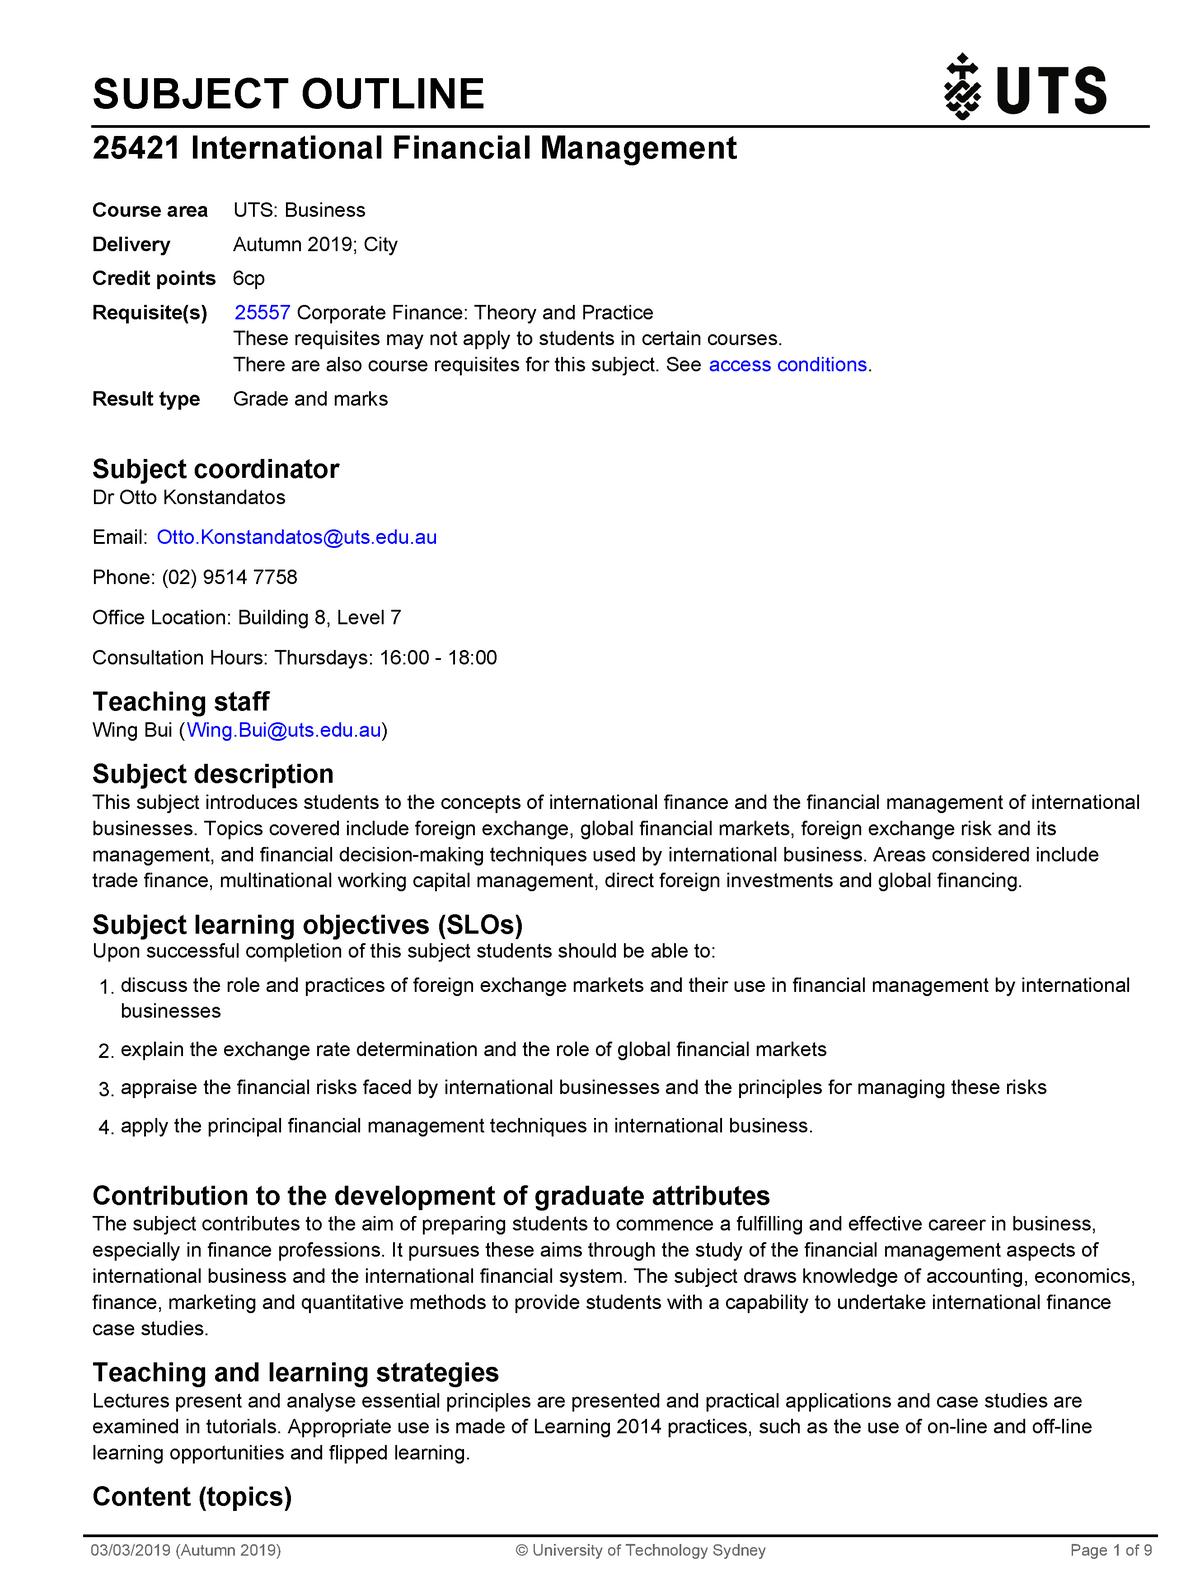 International Financial Management Outline - 020501 - UTS